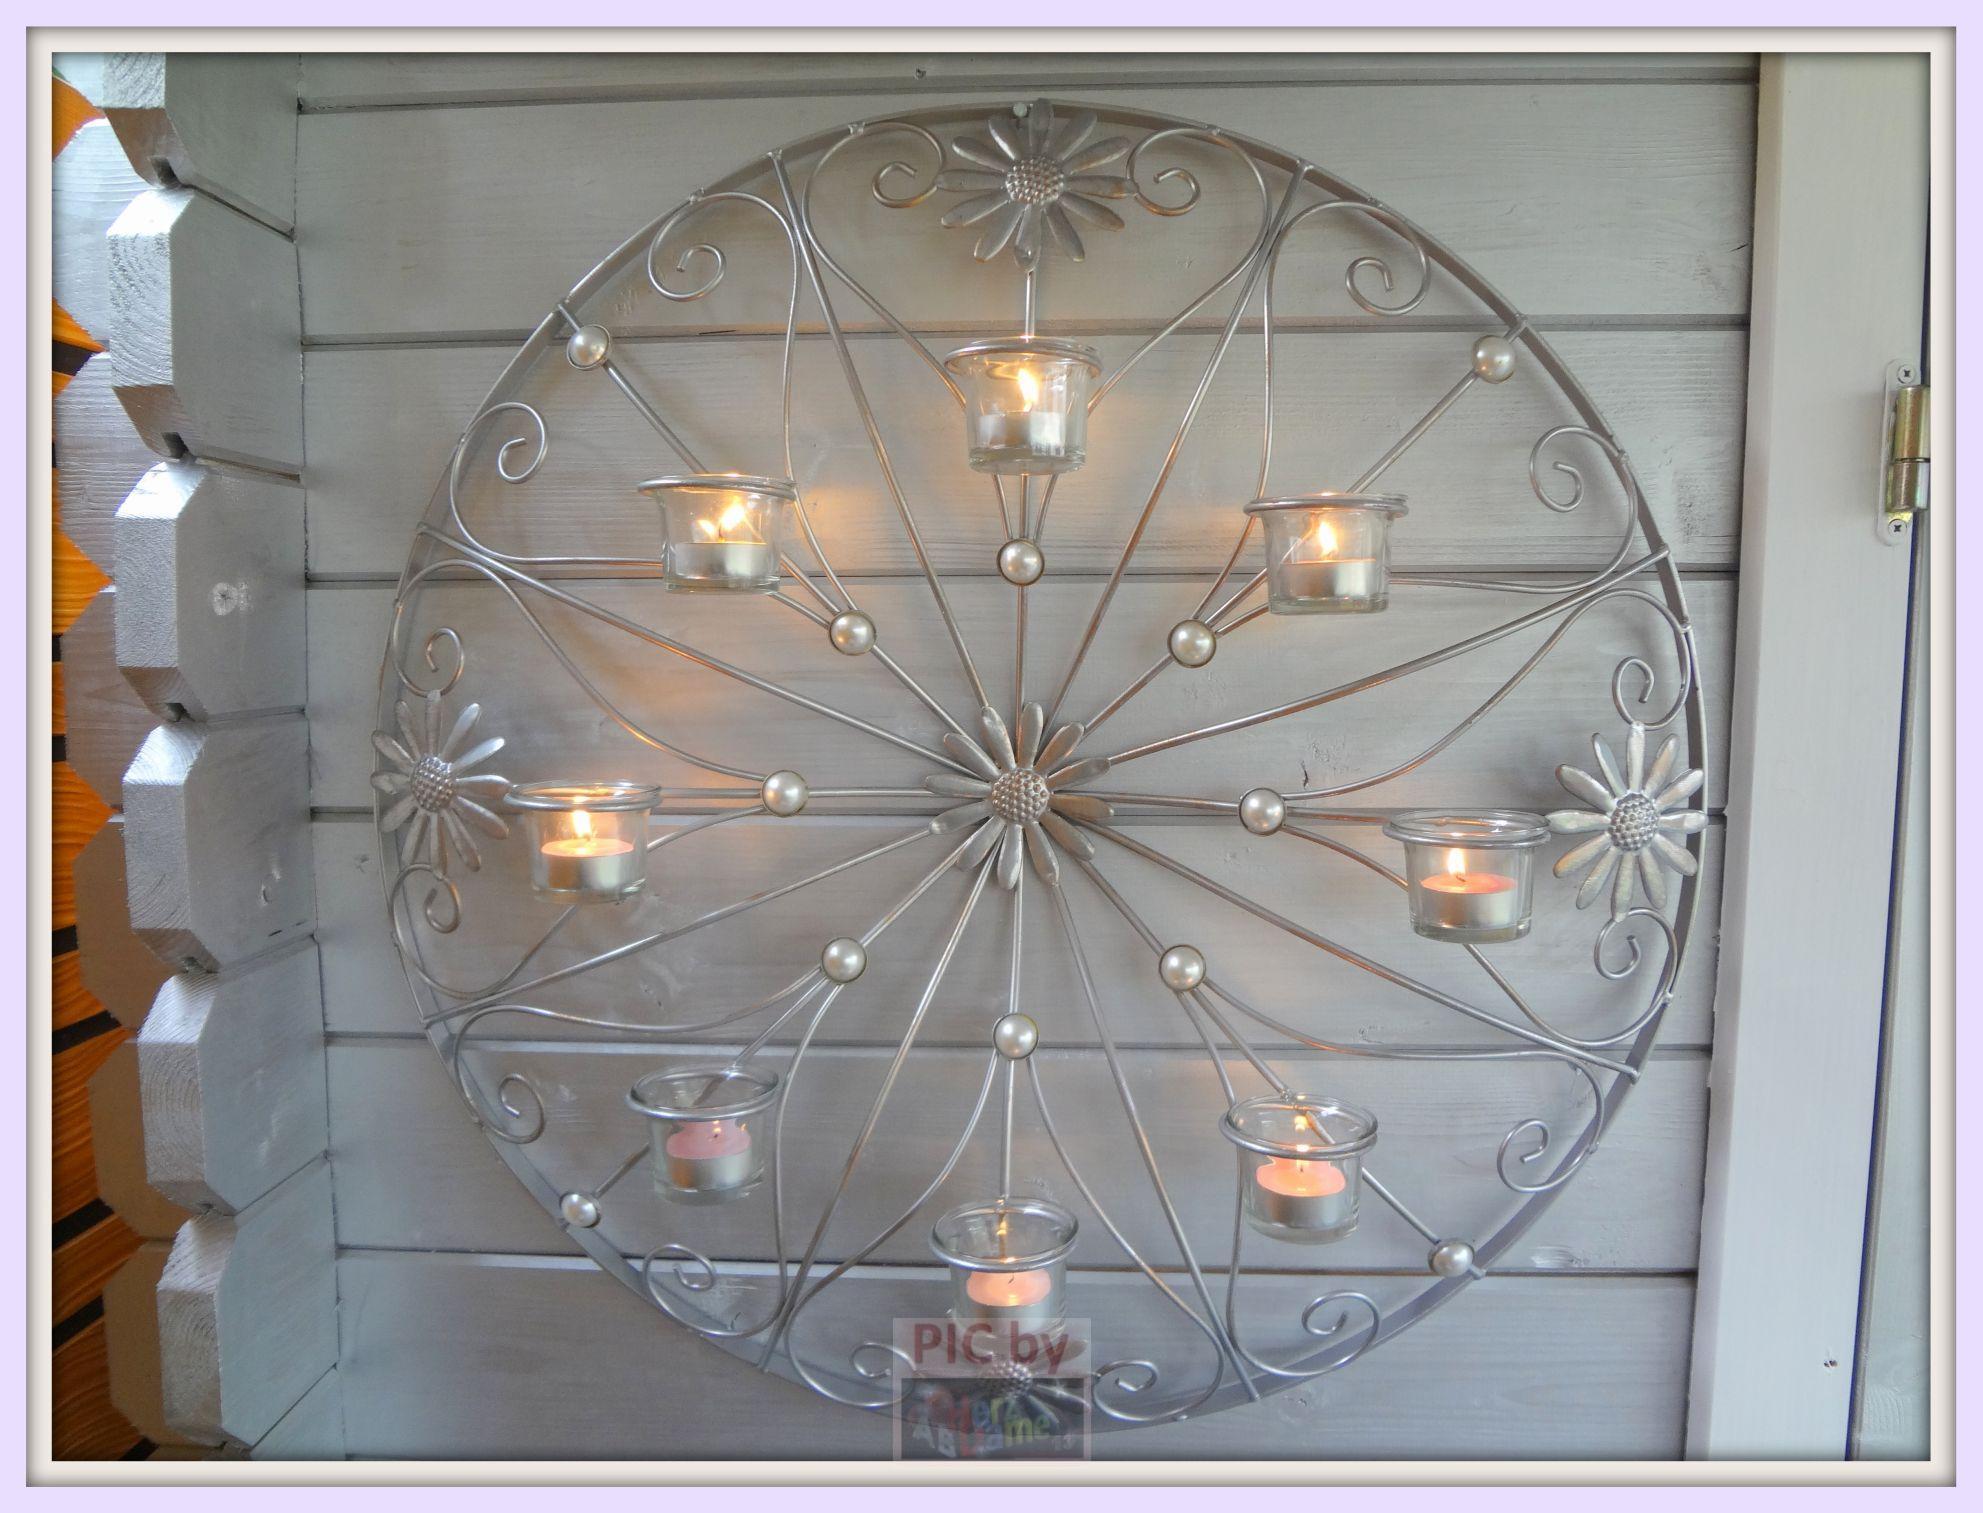 ab982 wand deko xl 8er teelichthalter blumenrad silber metall 62cm neu ebay. Black Bedroom Furniture Sets. Home Design Ideas